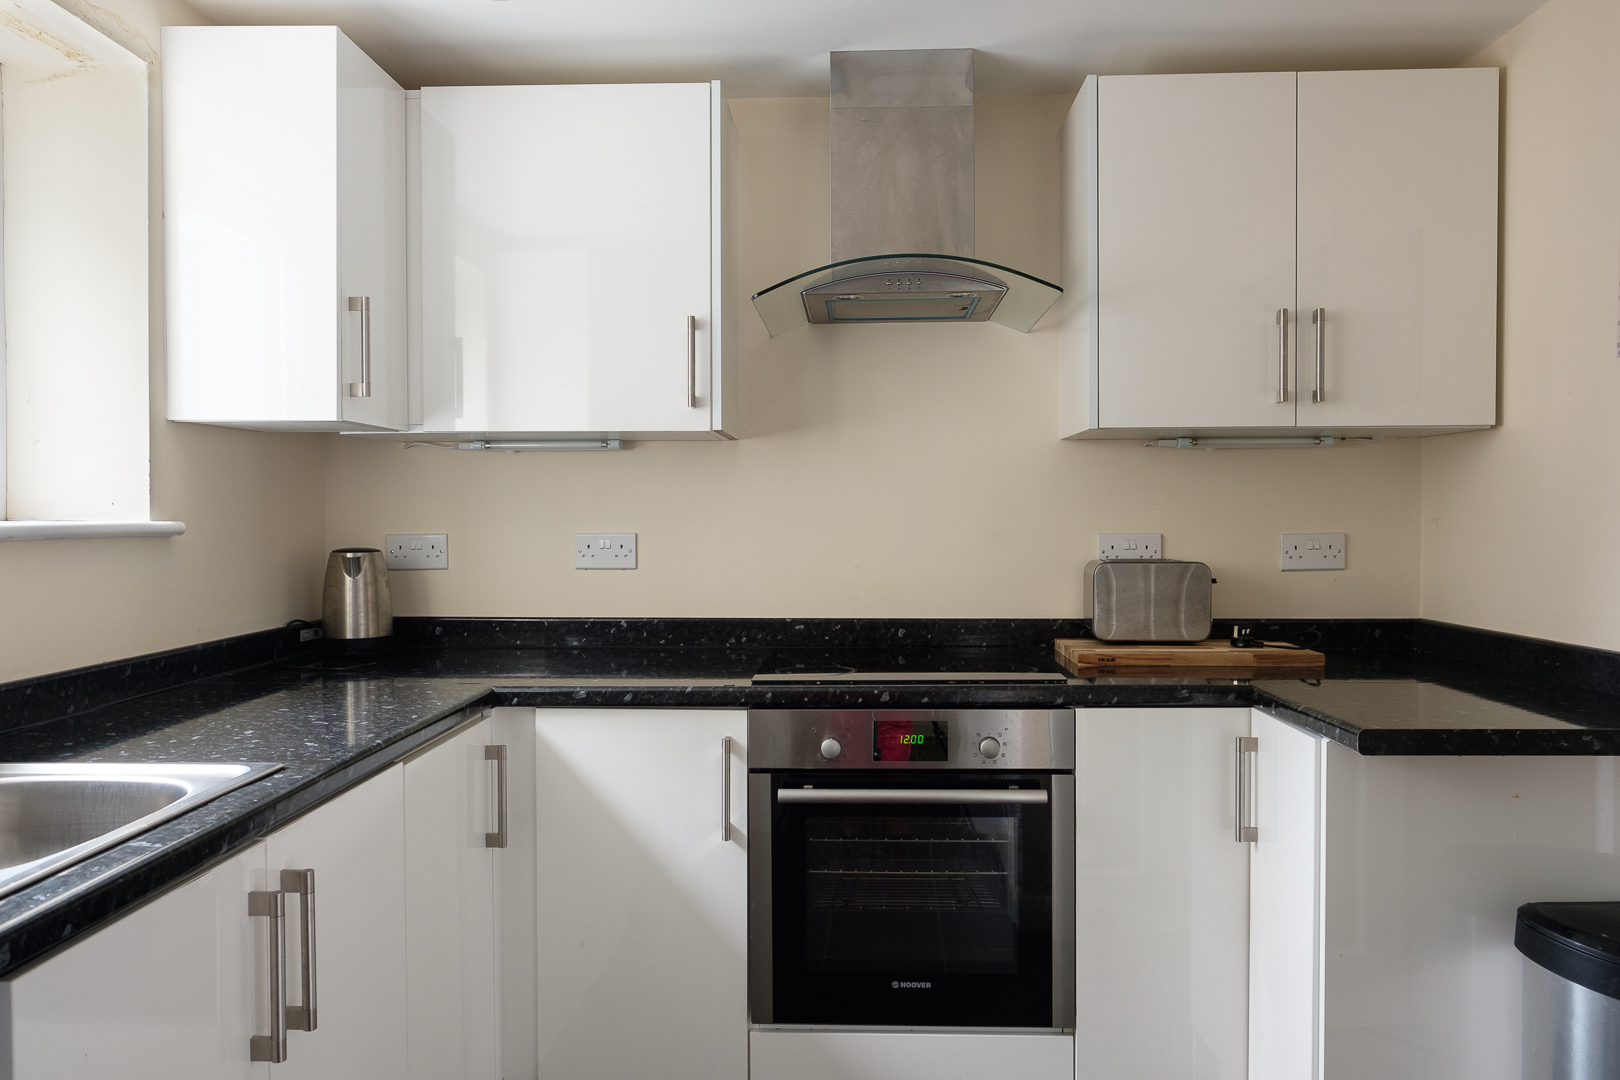 Oven at Broadwalk Apartment, Centre, Crawley